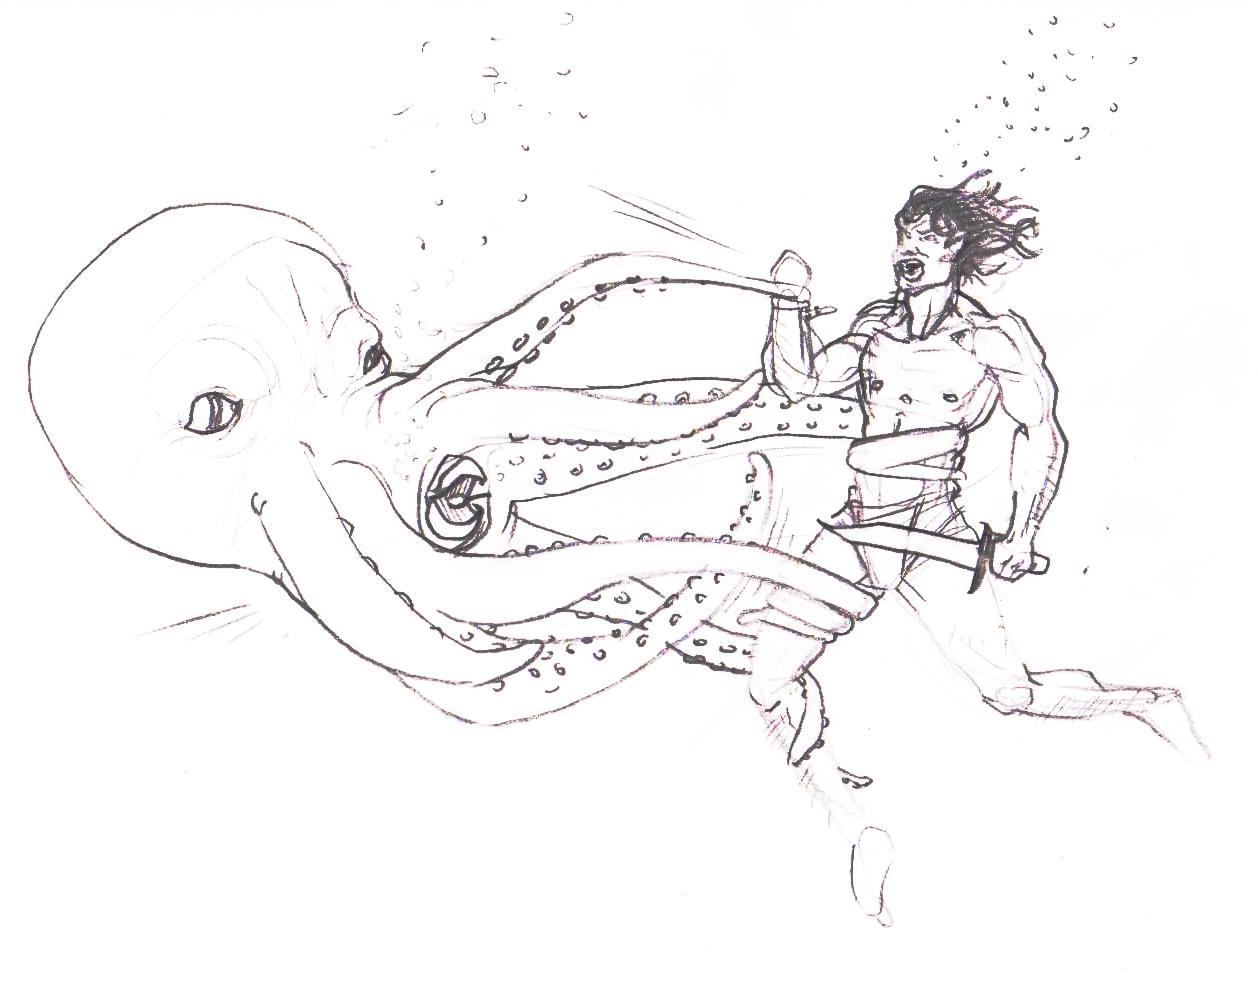 leapfrog coloring pages imagination desk - photo#14